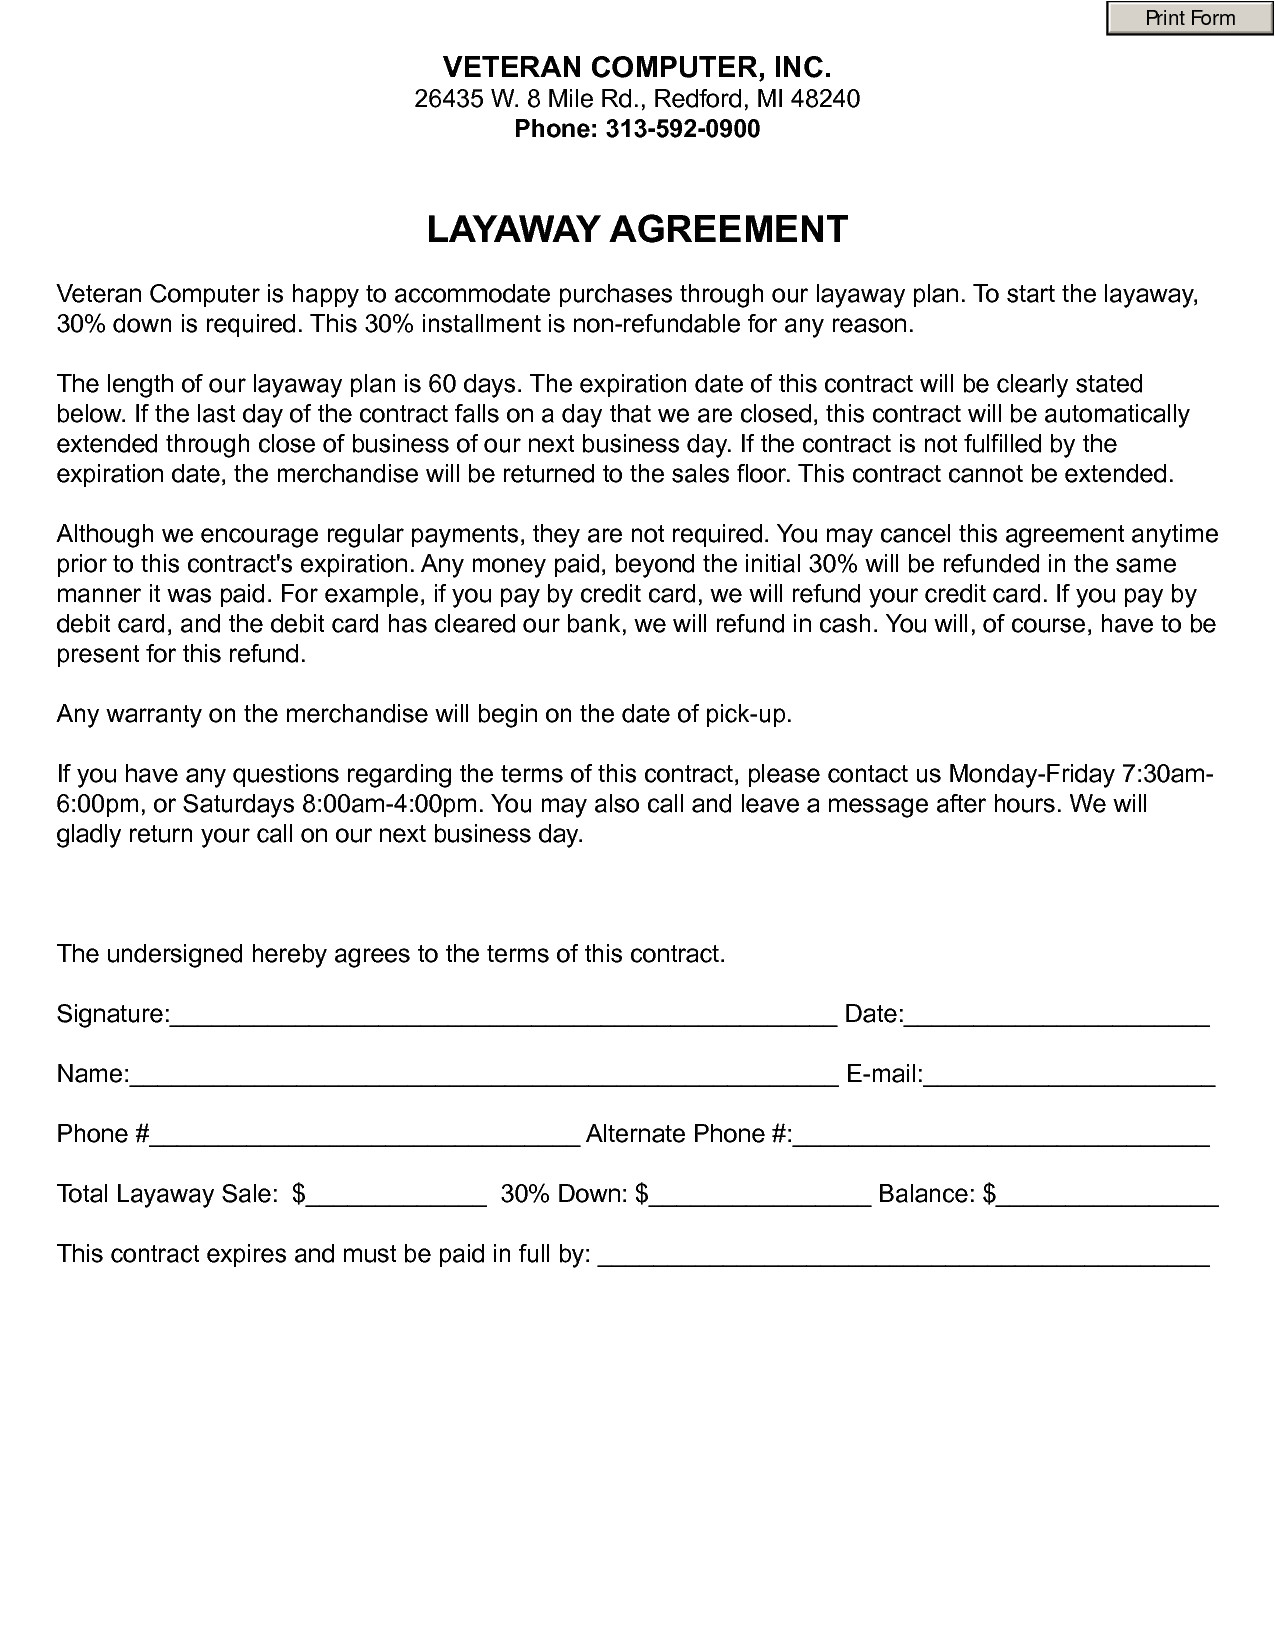 post retail layaway forms printable 252350